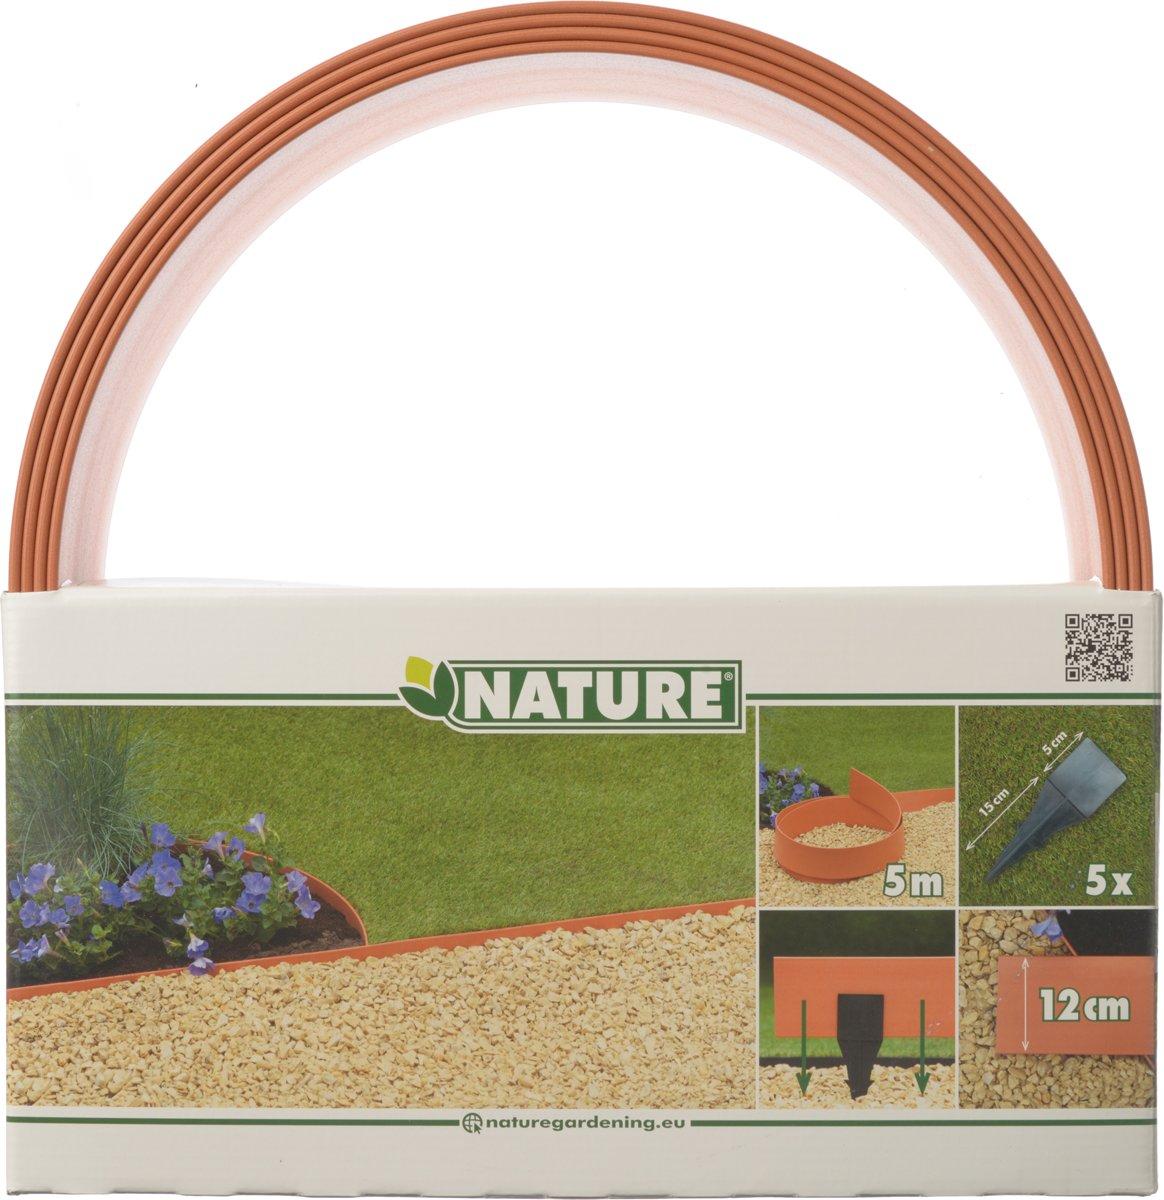 Nature - Borderrand - Terracotta - Hoogte 12cm x 5m - Dikte 4,5mm kopen